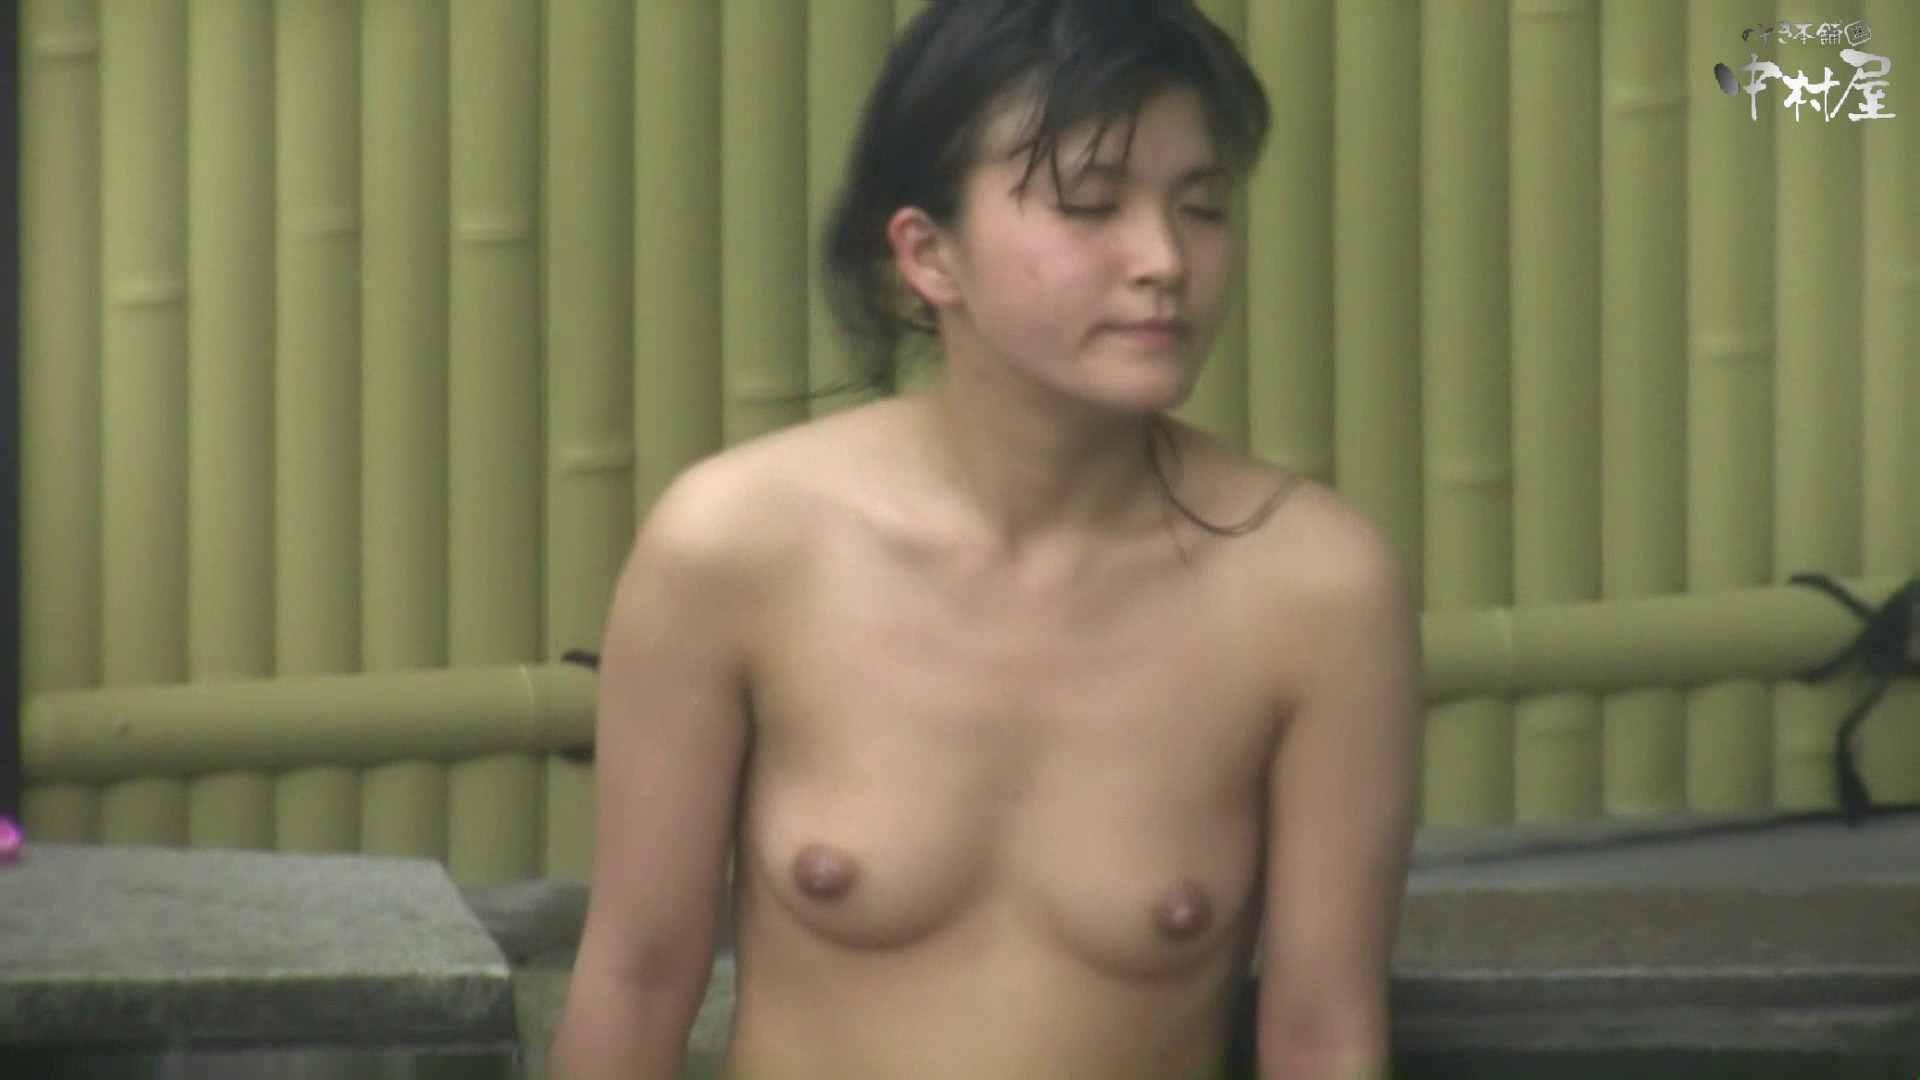 Aquaな露天風呂Vol.894 盗撮シリーズ | 露天風呂編  85PIX 5